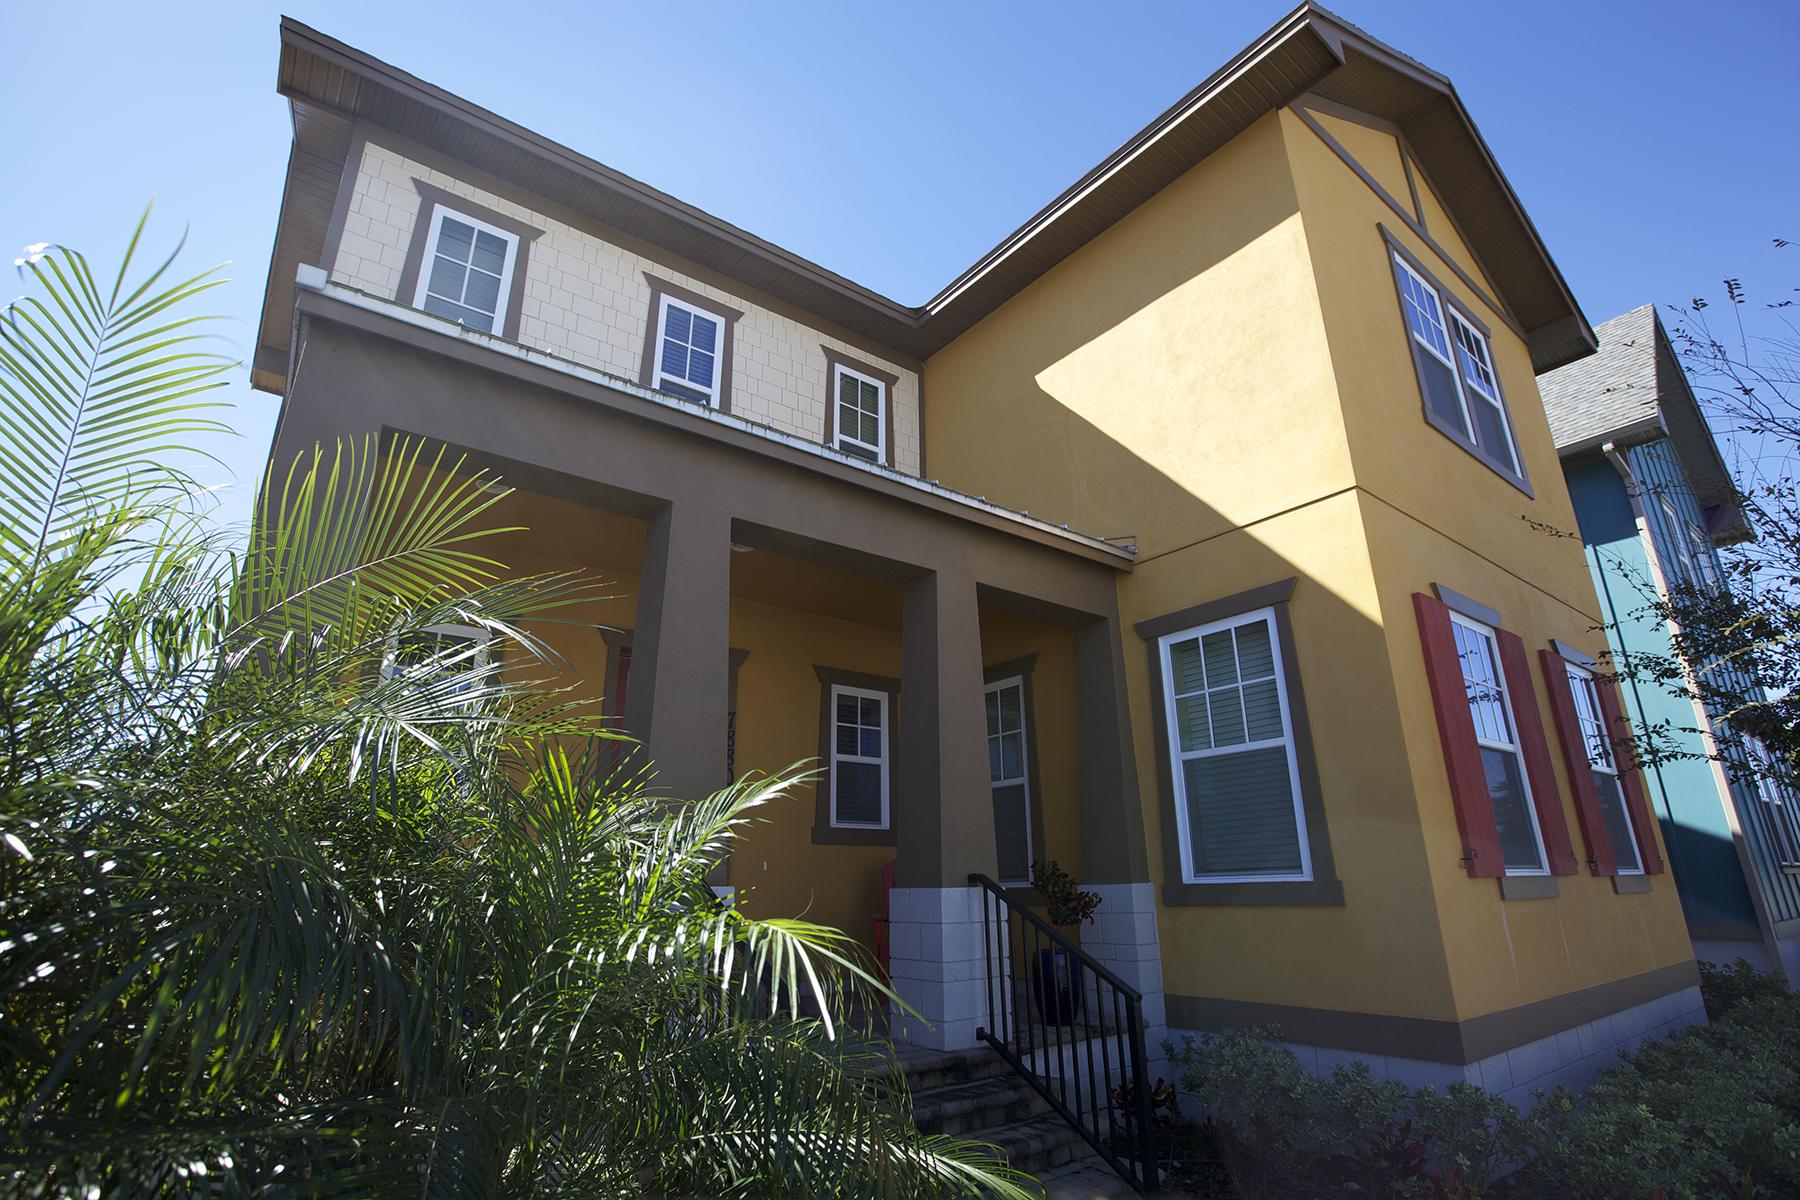 Single Family Home for Sale at LAKE NONA 7880 Laureate Blvd Orlando, Florida, 32827 United States